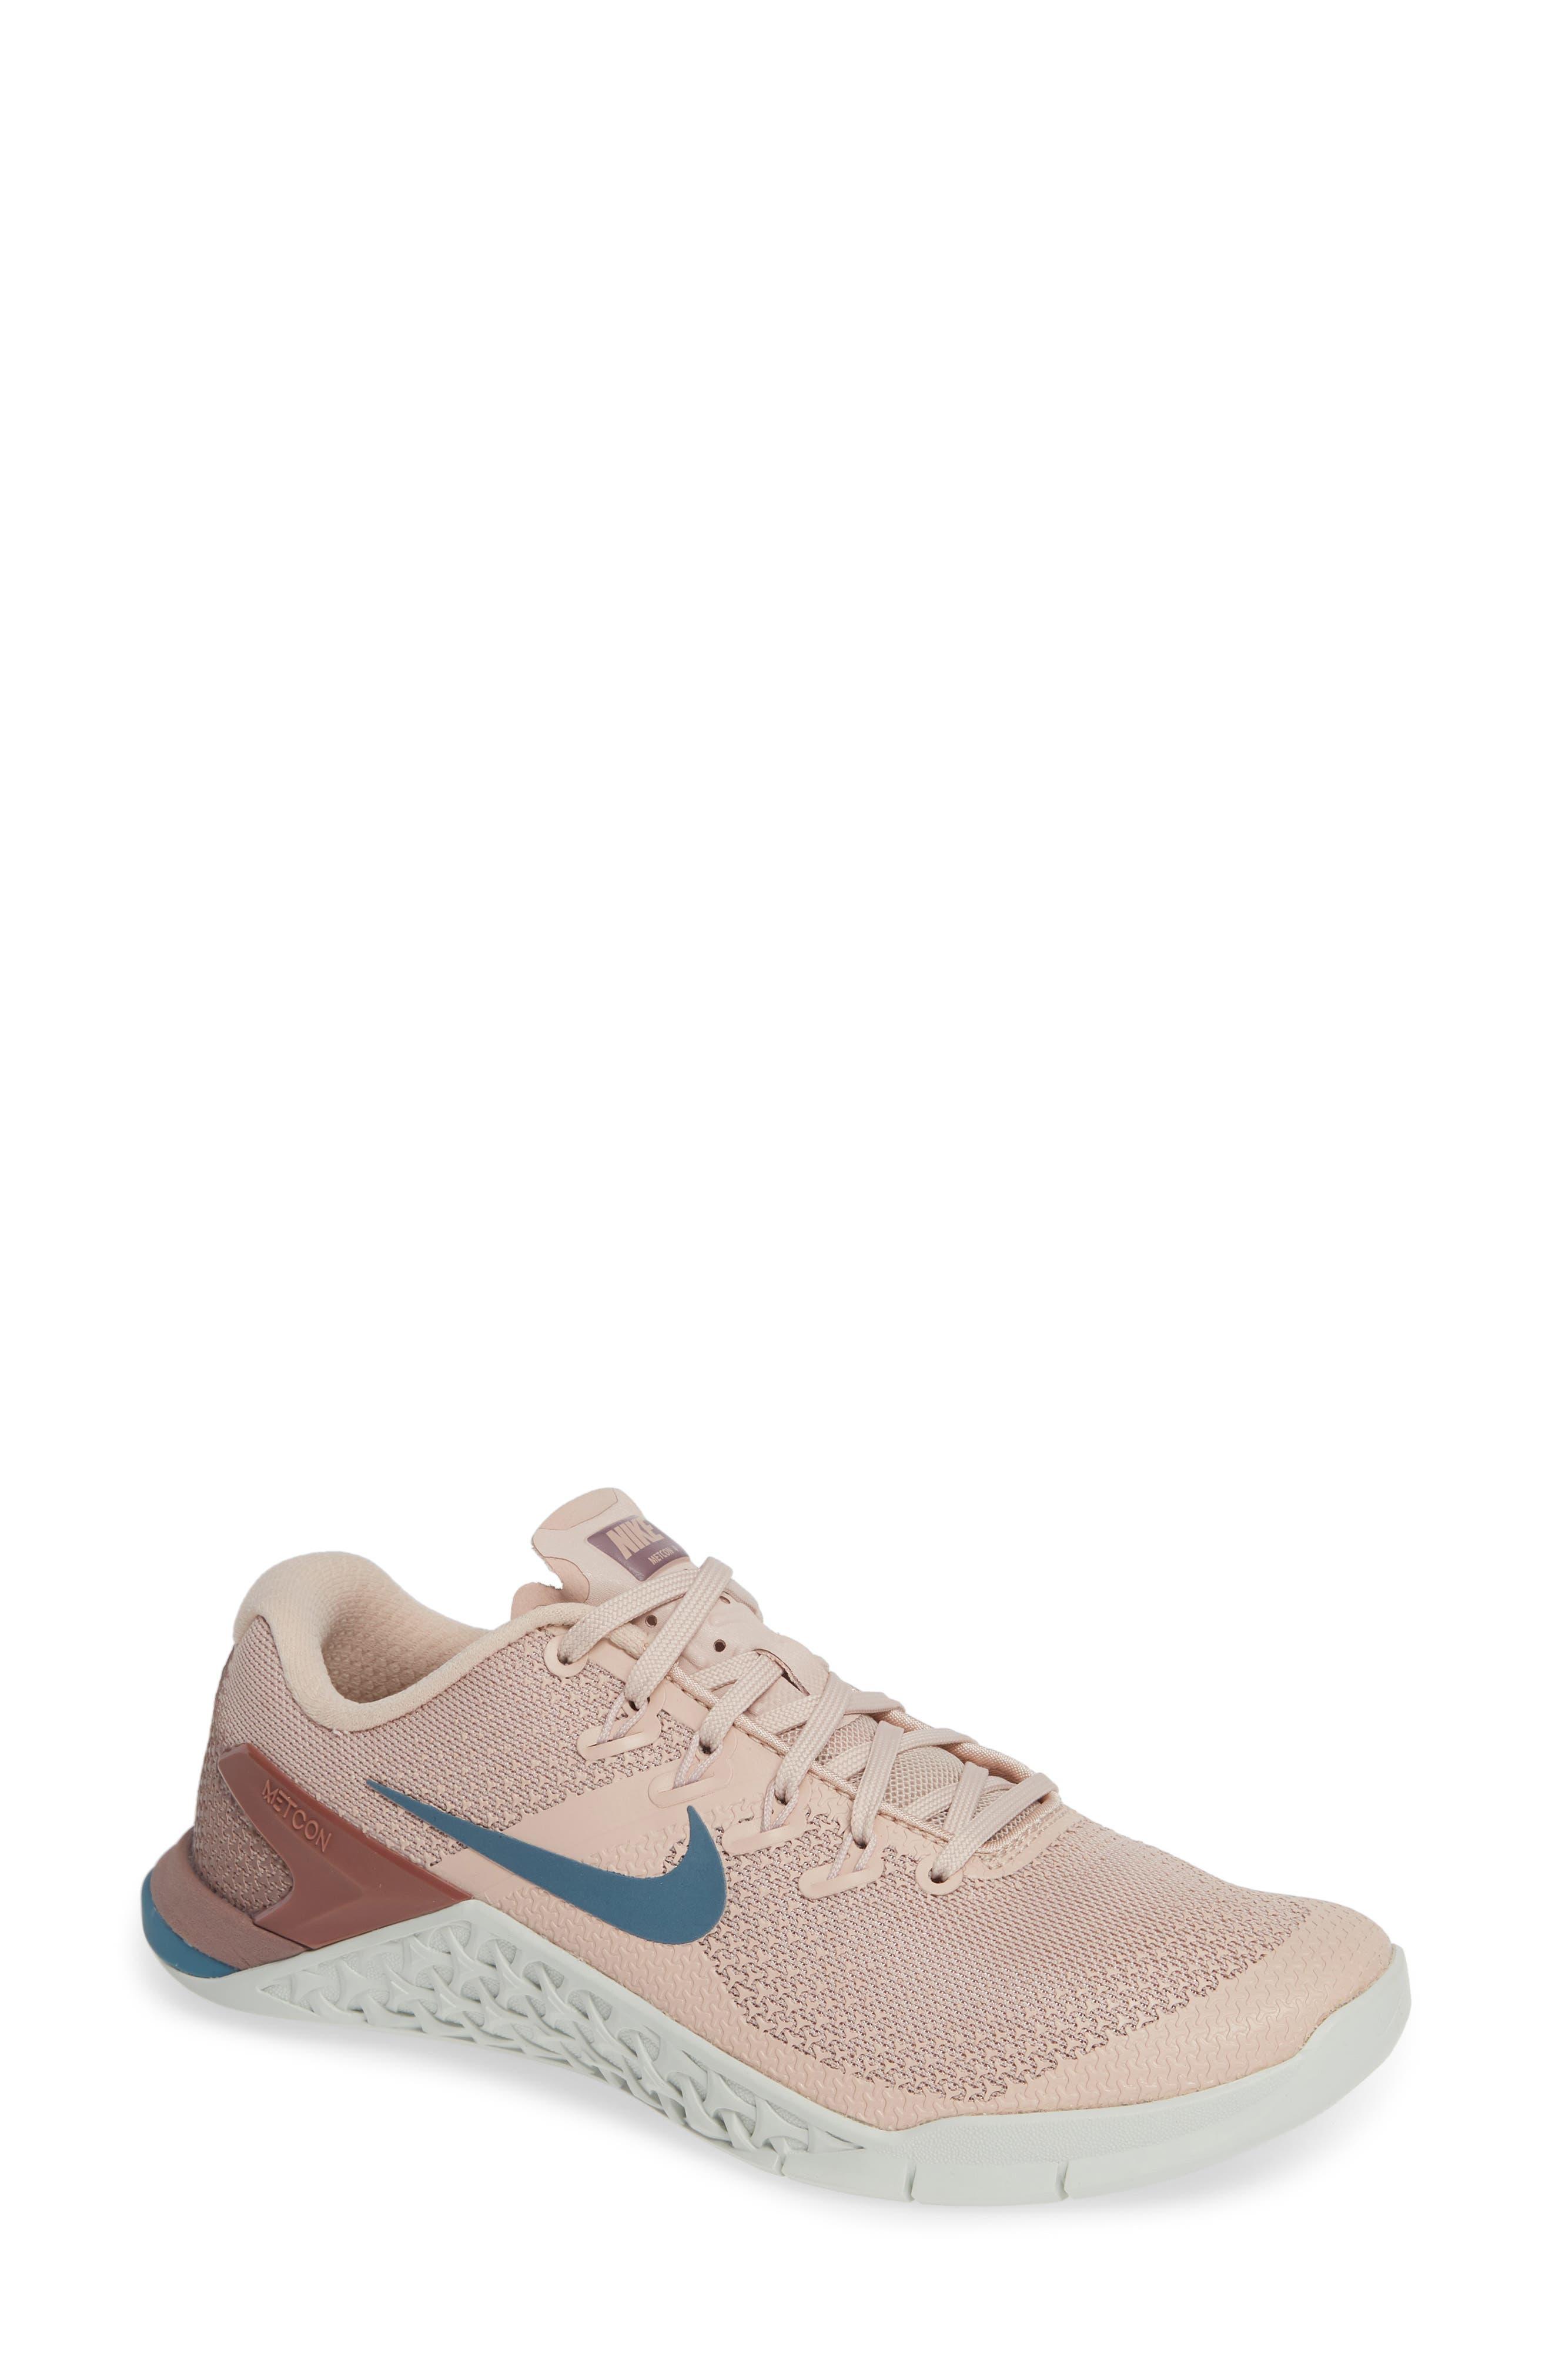 Metcon 4 Training Shoe,                         Main,                         color, PARTICLE BEIGE